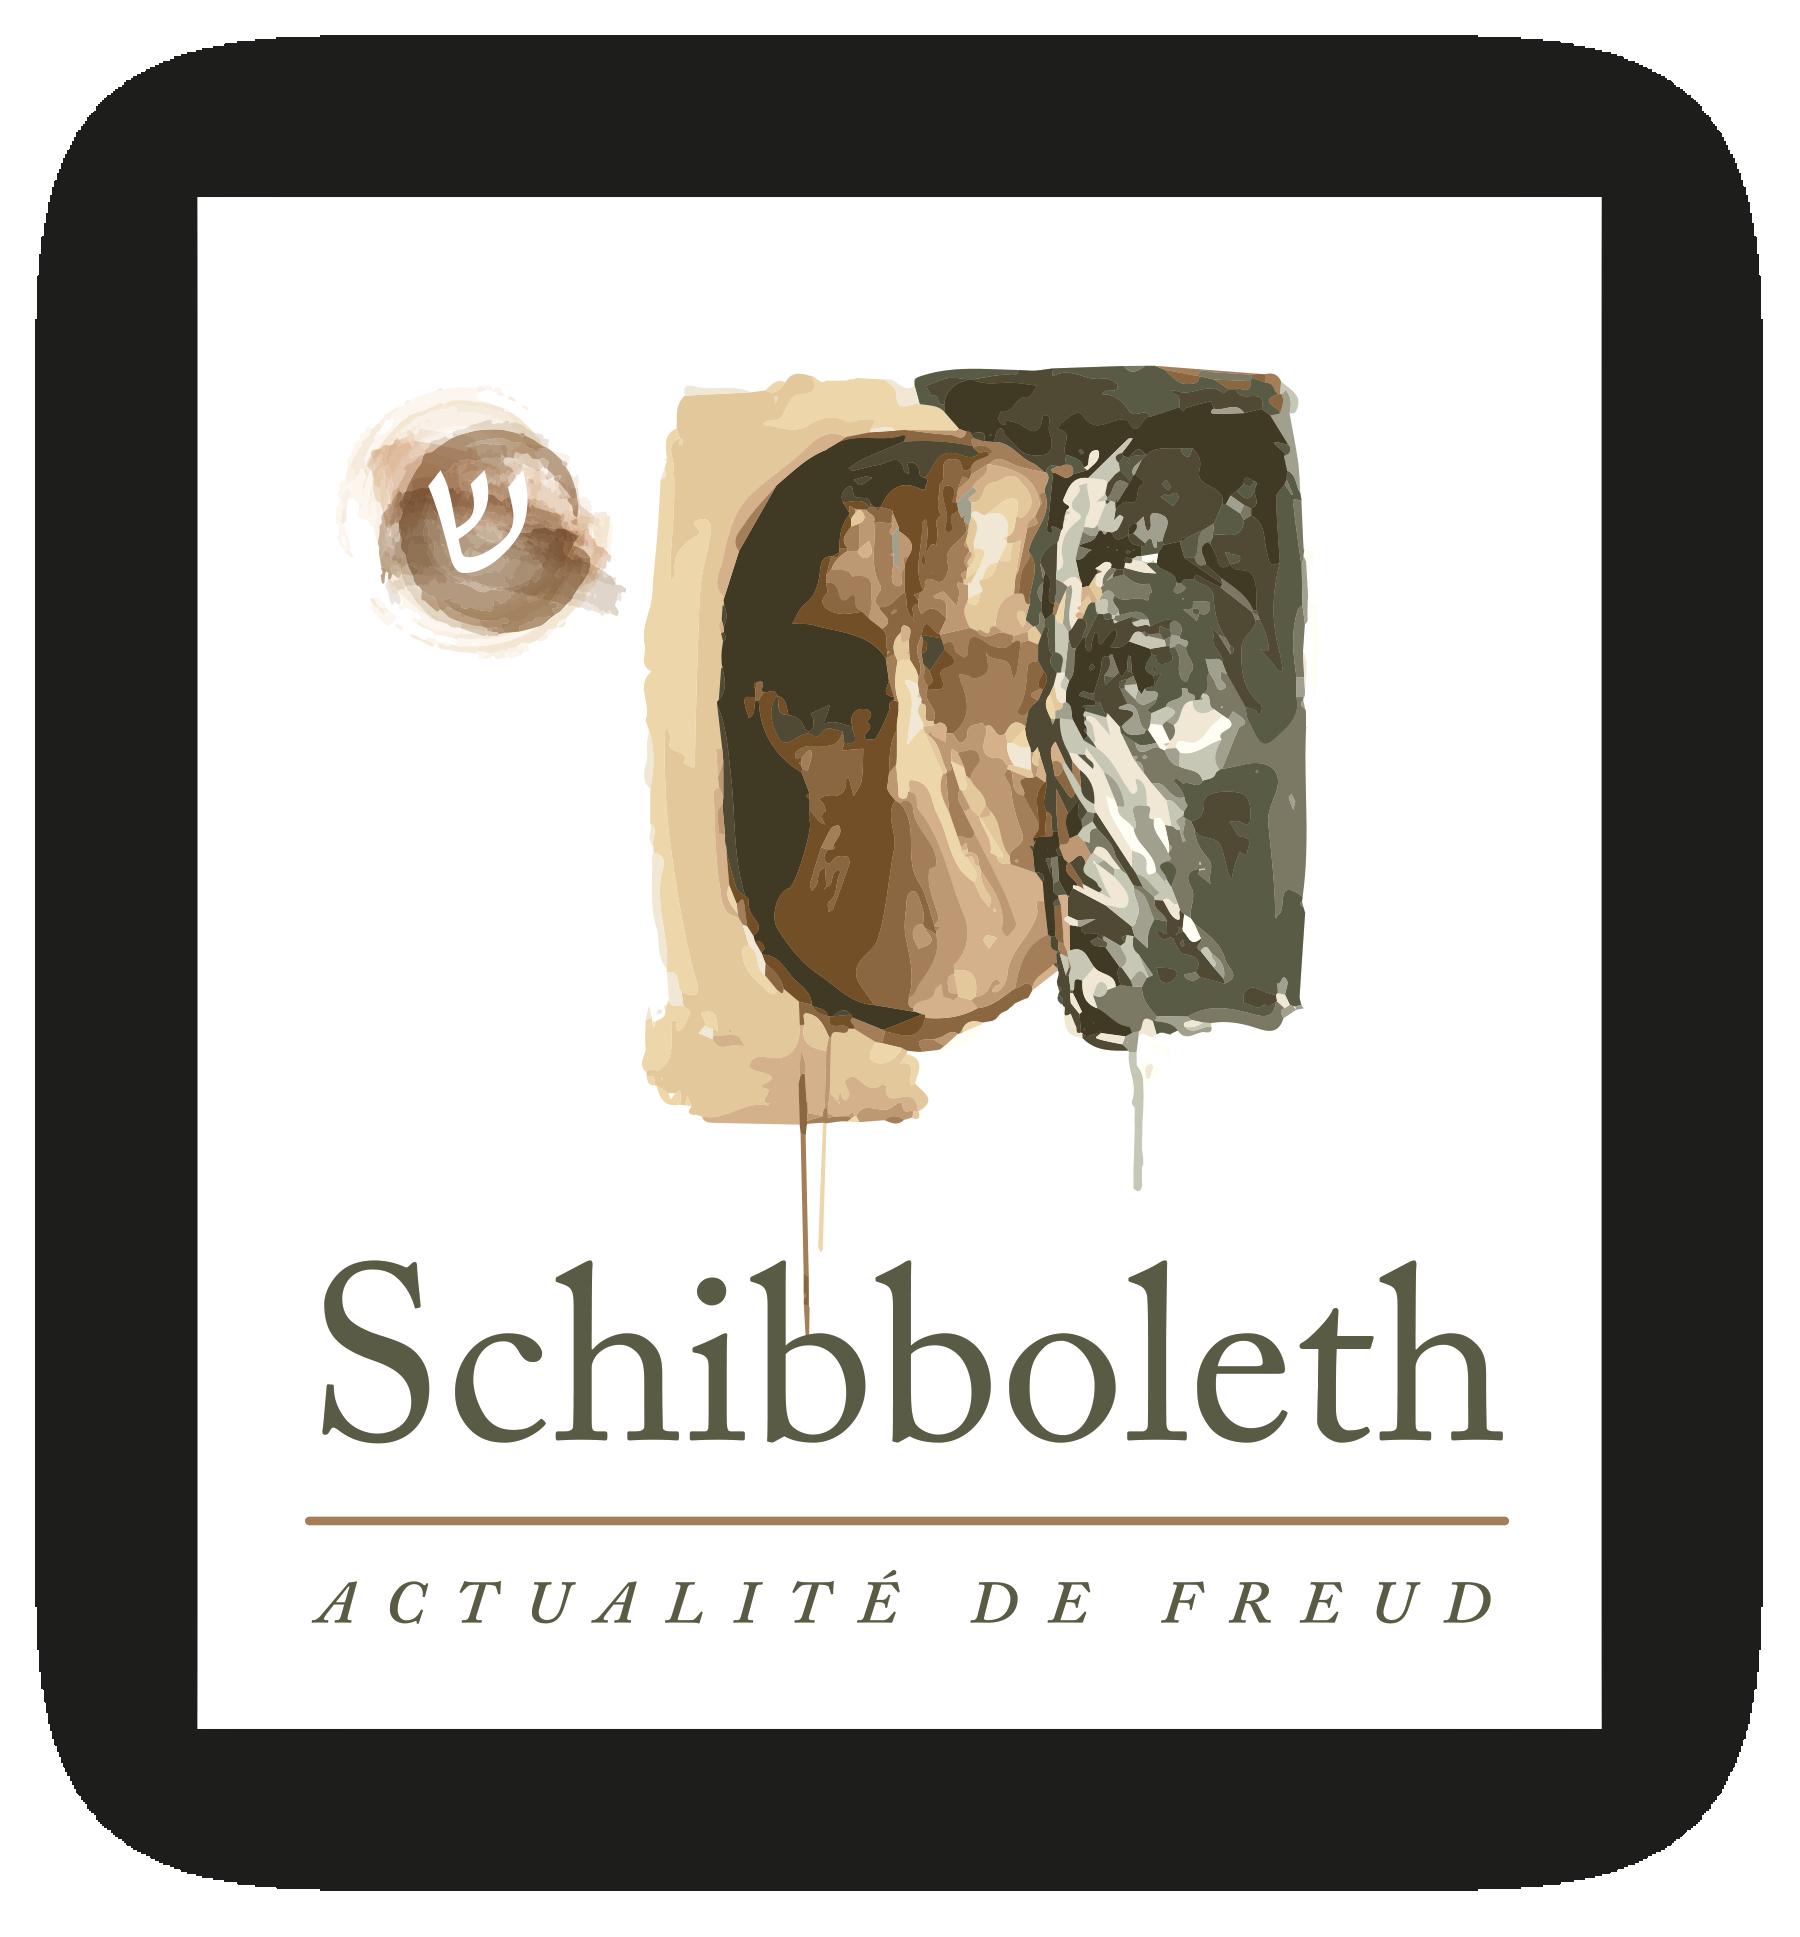 Schibboleth-Actualite de Freud